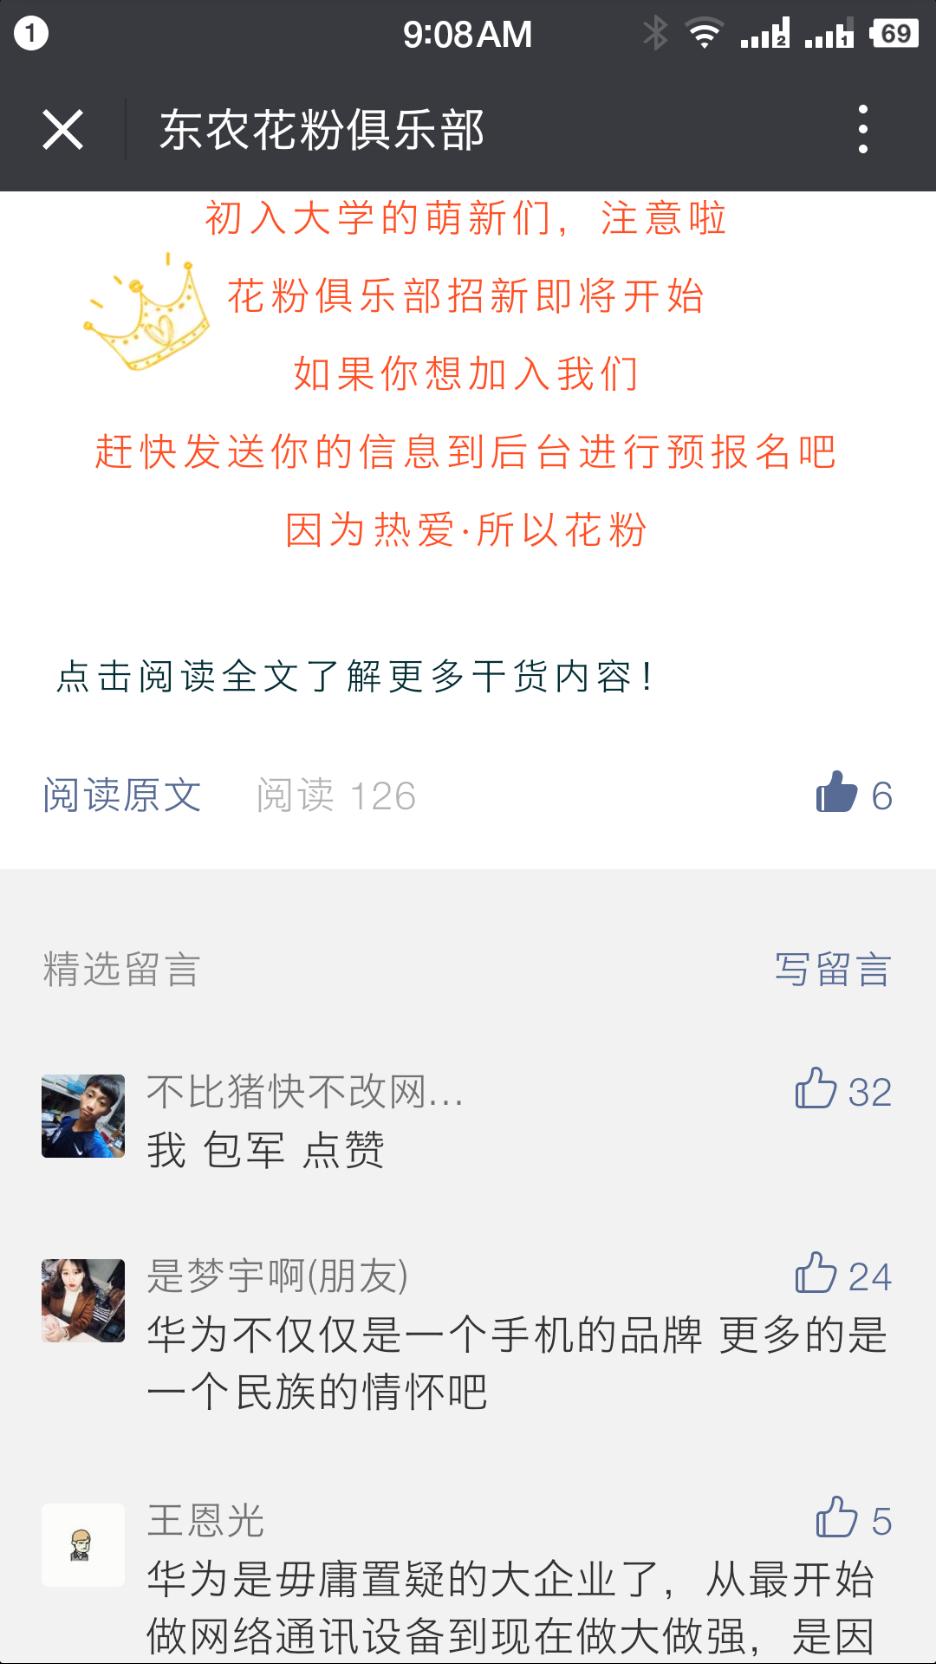 Screenshot_2019-02-07-09-09-01-722_WeChat.png